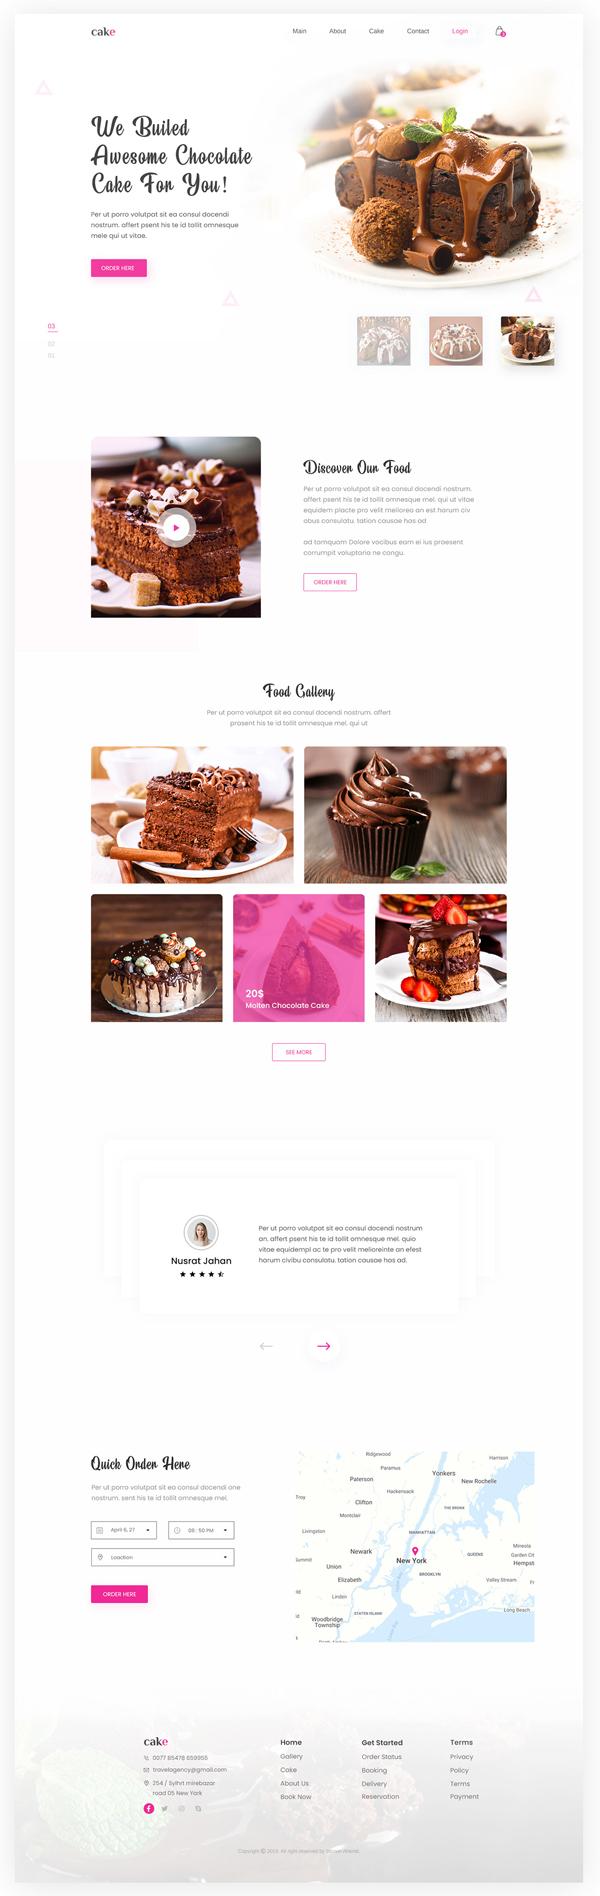 Free Cake Shop Landing Page Template